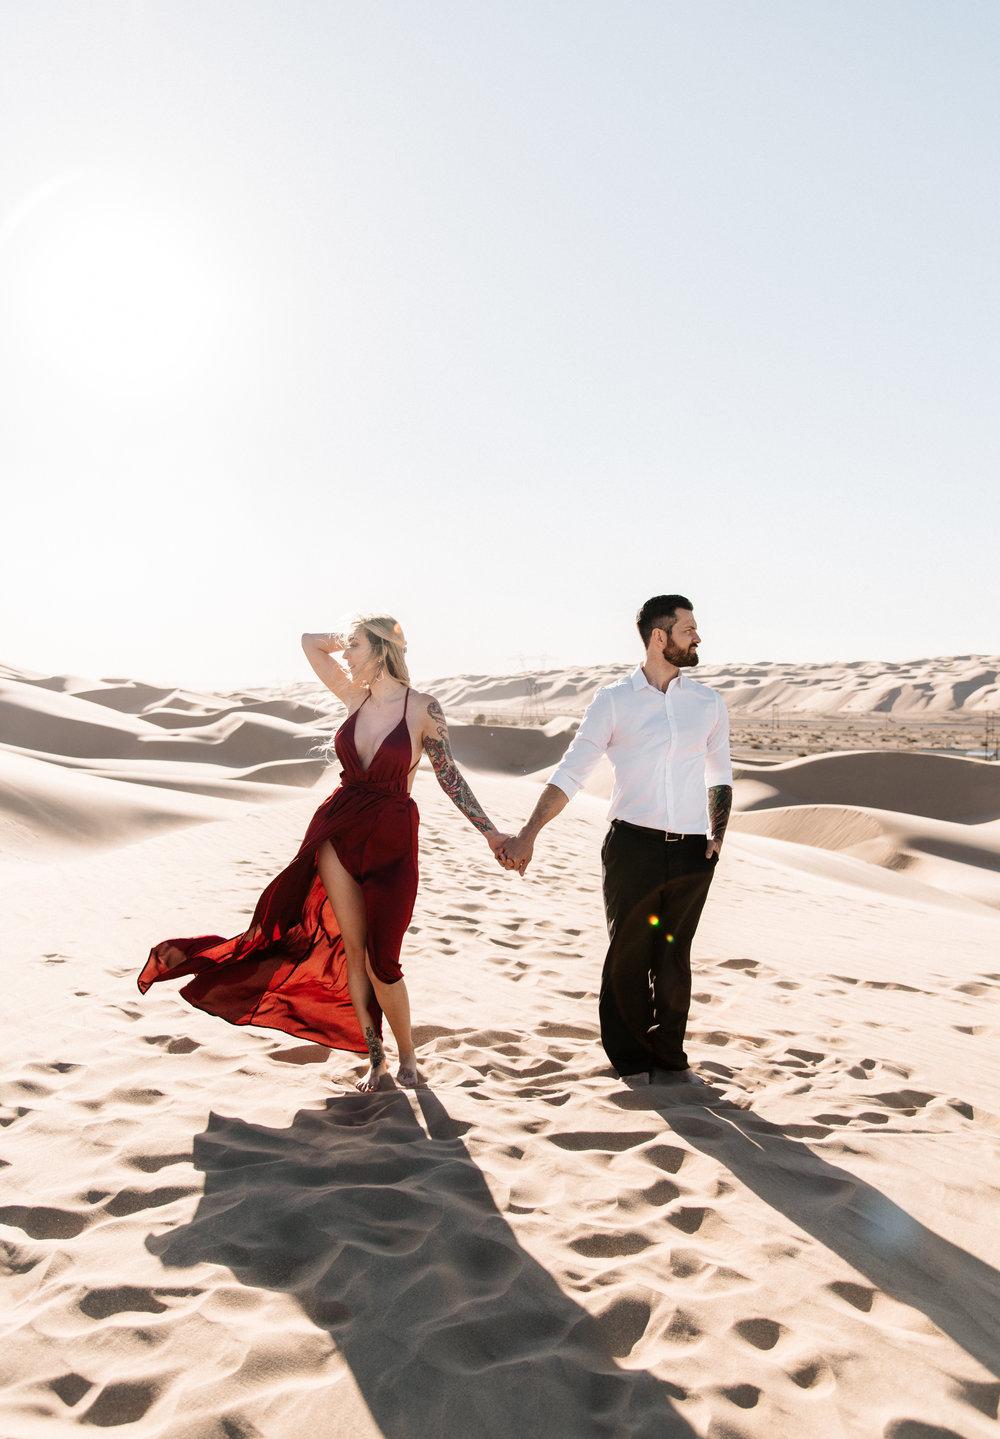 SamErica Studios - Modern San Diego Engagement Photographer - Adventure Engagement Session in Glamis Sand Dunes California-34.jpg